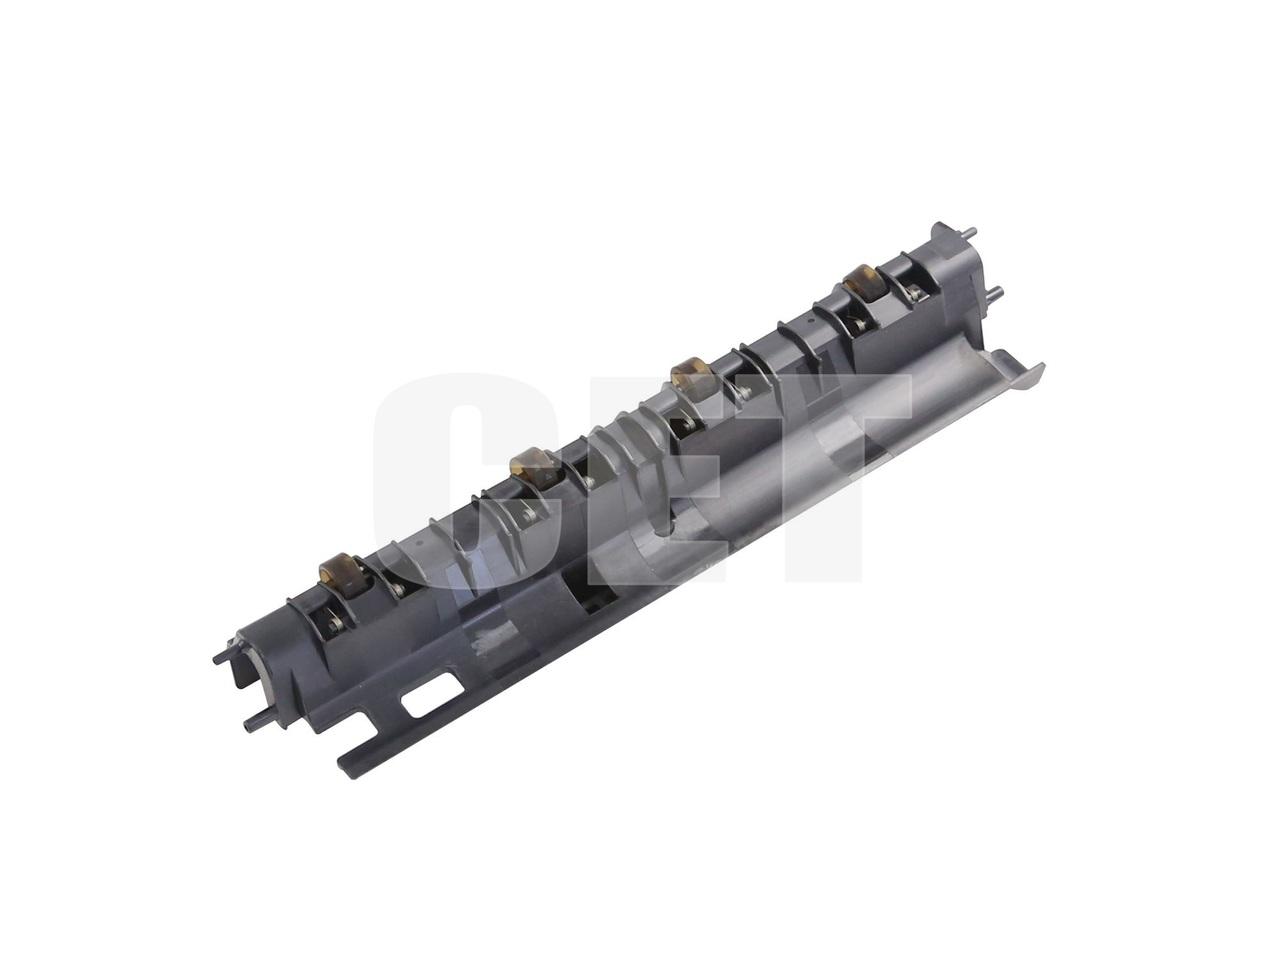 Направляющая выхода фьюзера в сборе RC4-7284-000 дляHP LaserJet Enterprise M607dn/608dn/609dn, MFP M631dn/632h(CET), CET371006